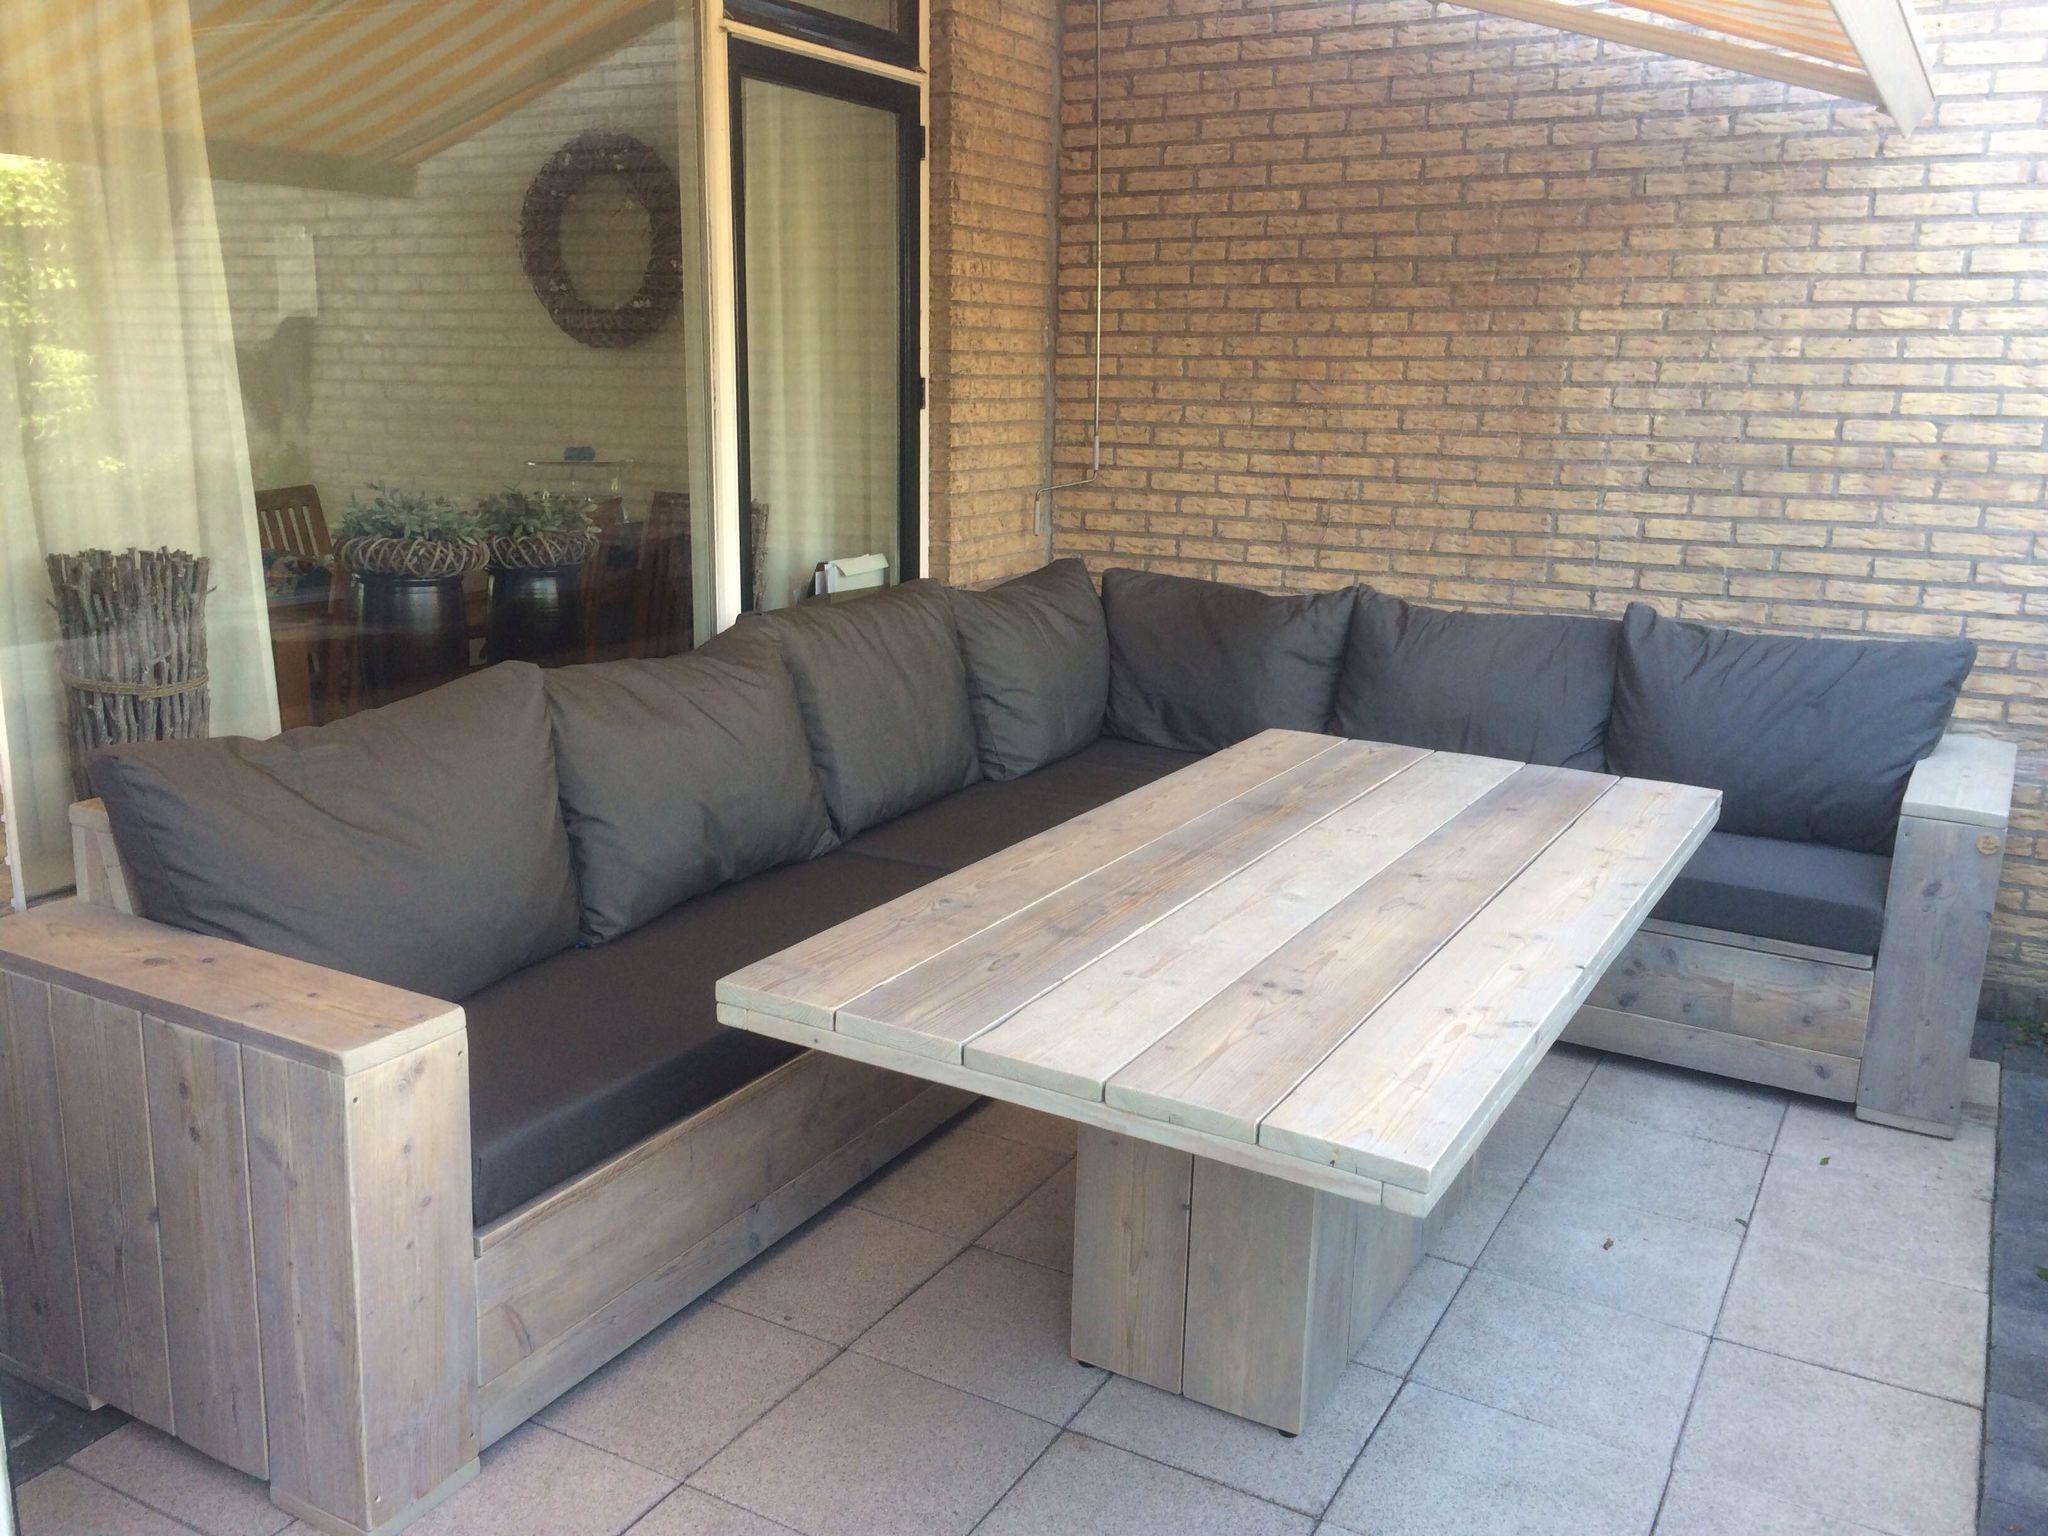 Esszimmer ideen im freien lounge dining set van steigerhout  x  en  x   n